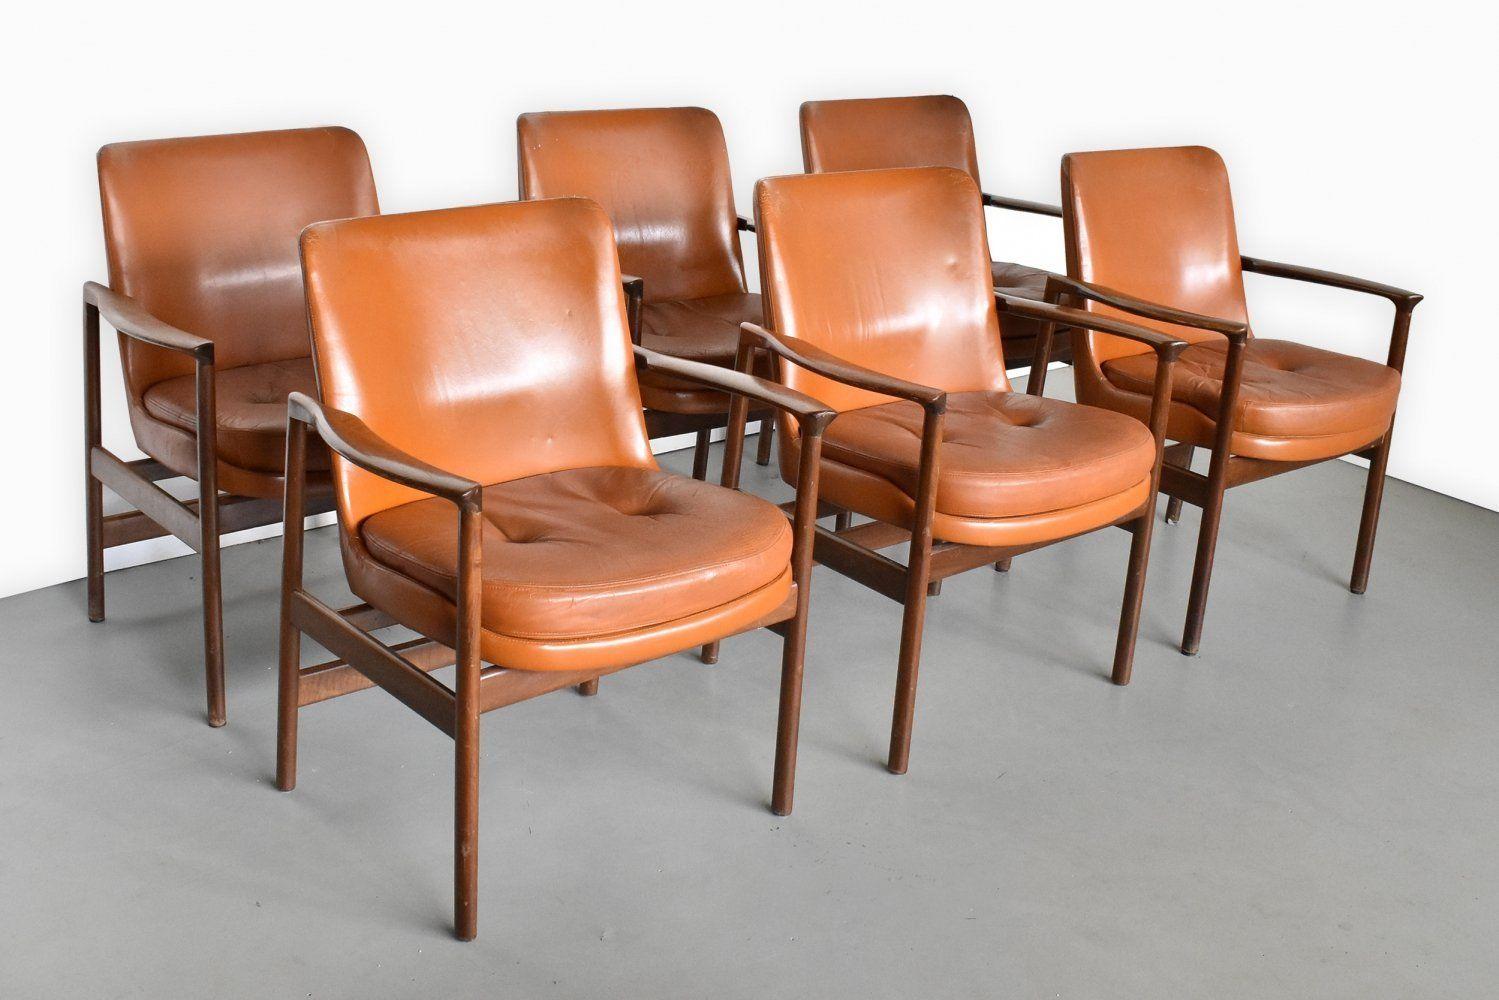 Design Scandinavo Anni 50 ボード「vintage design seating」のピン